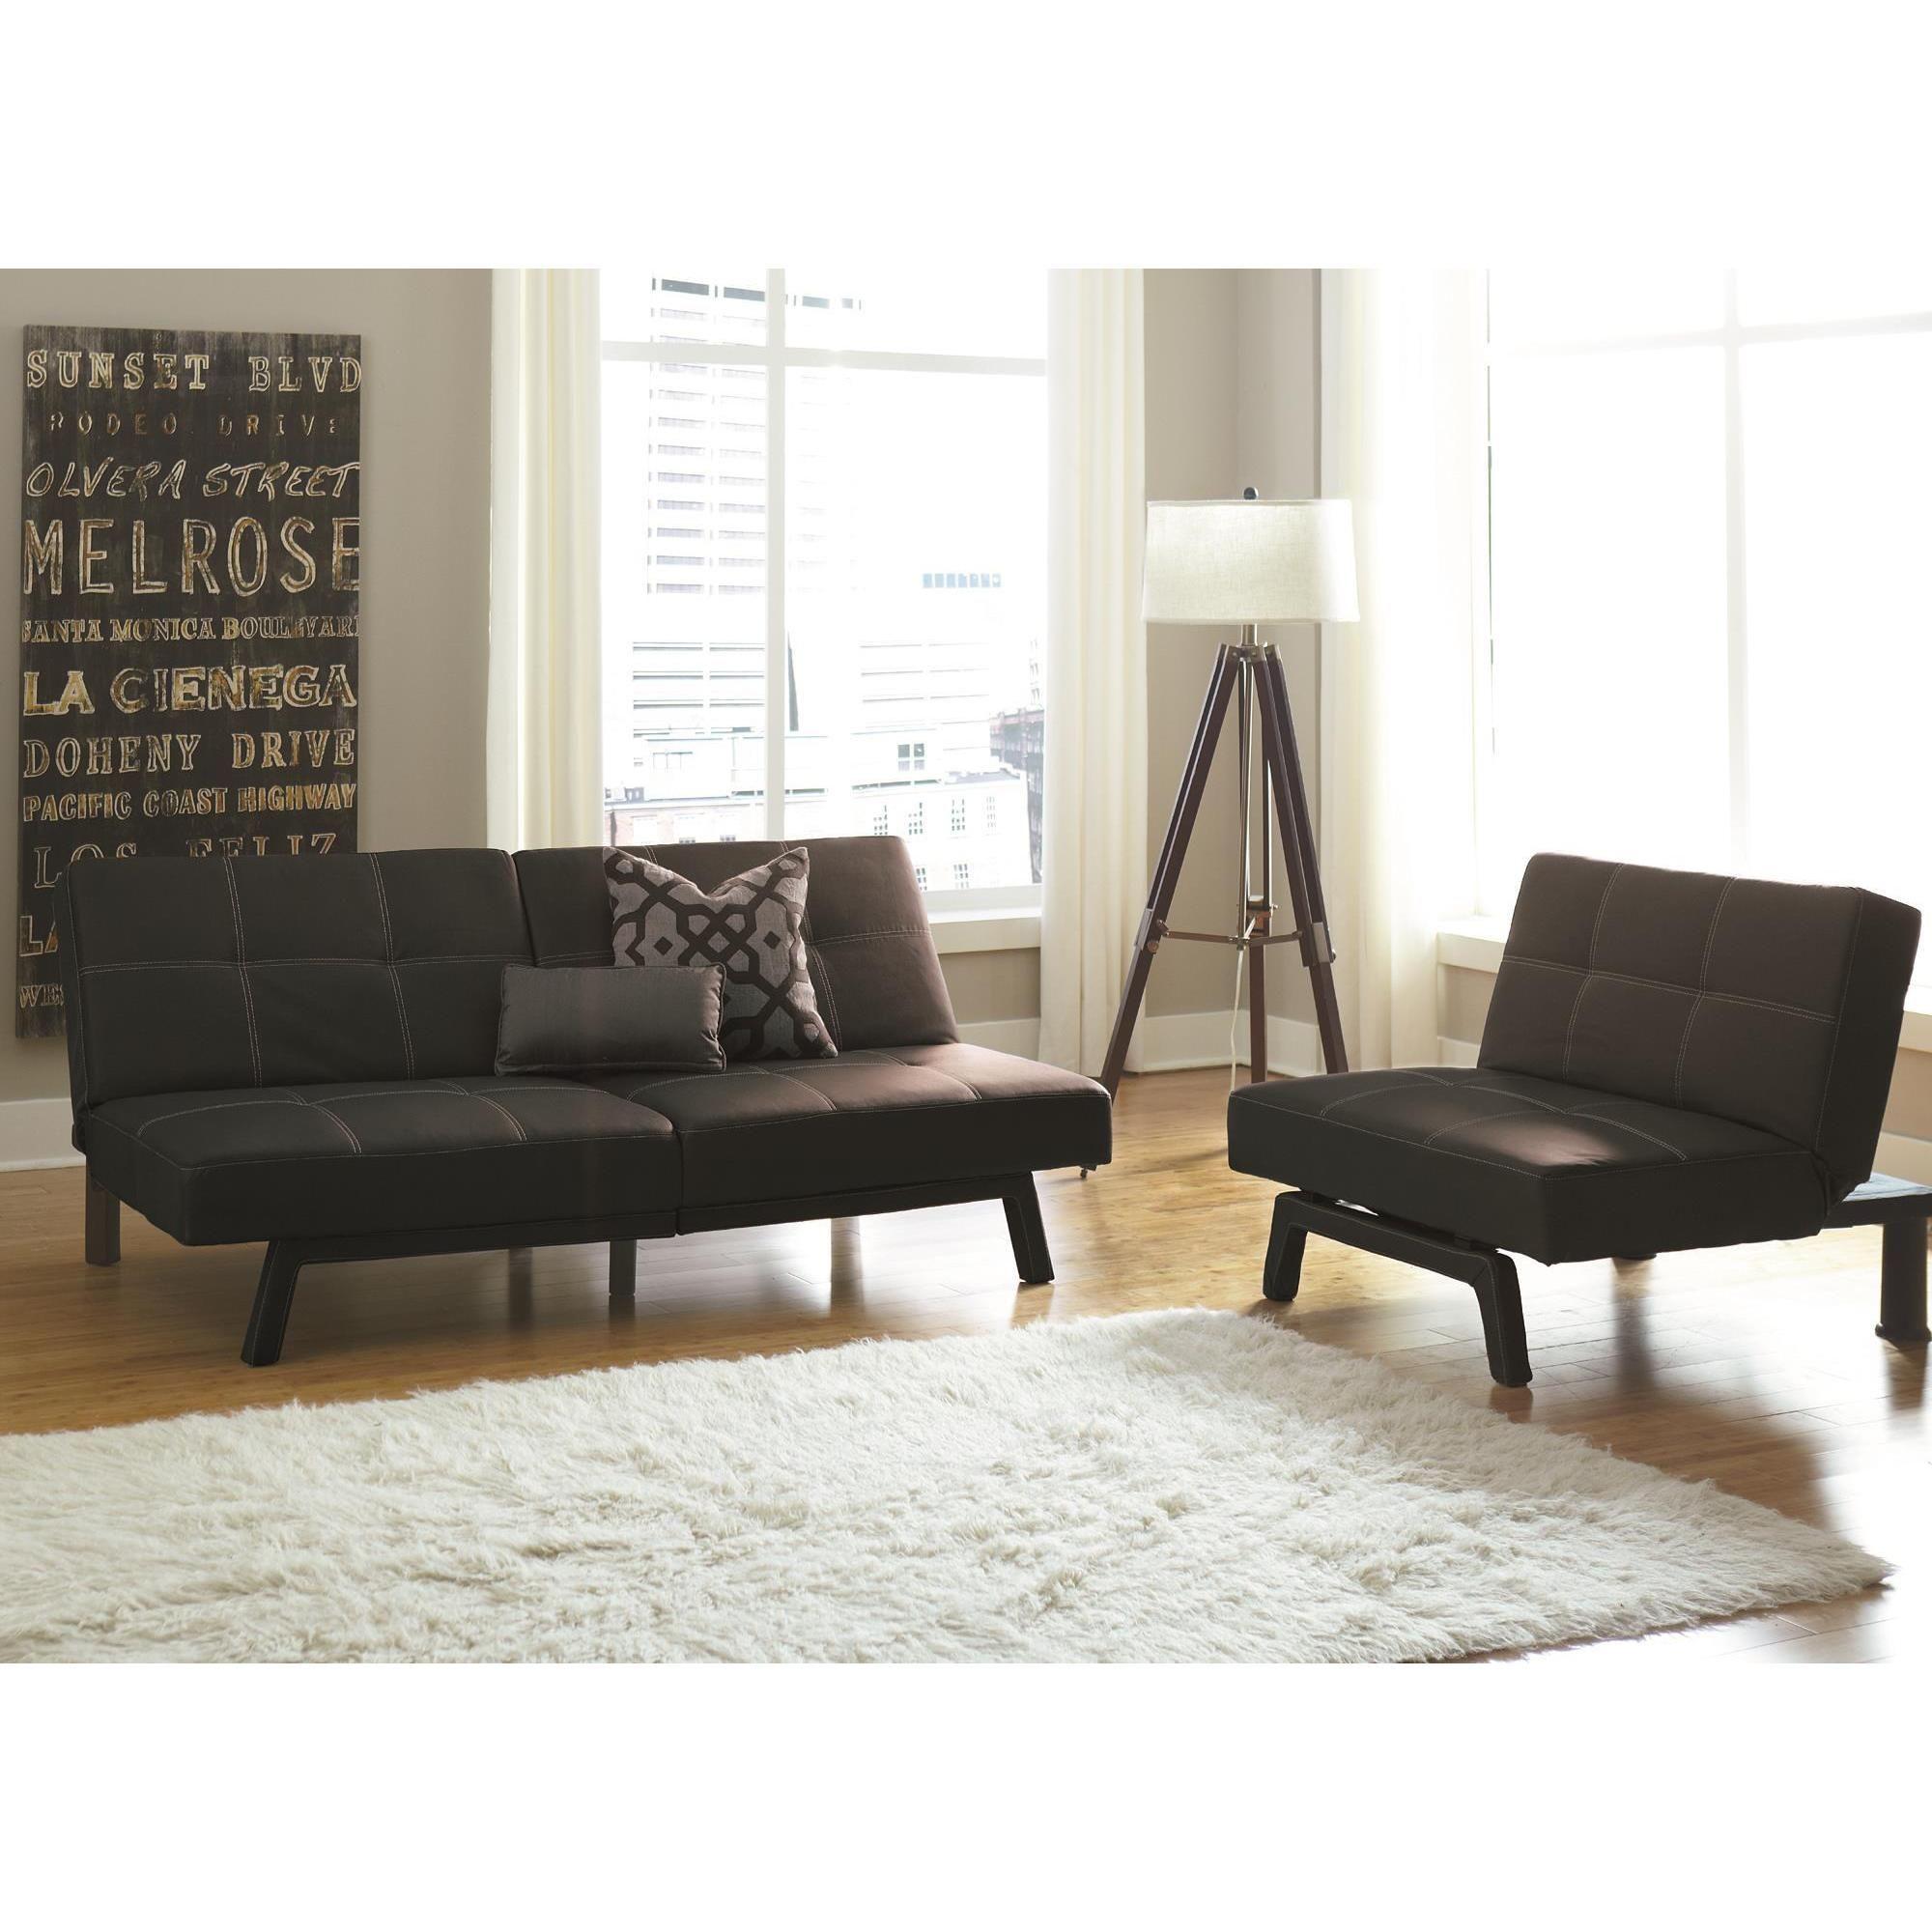 DHP Delaney Black Splitback Futon Splitback futon black Size